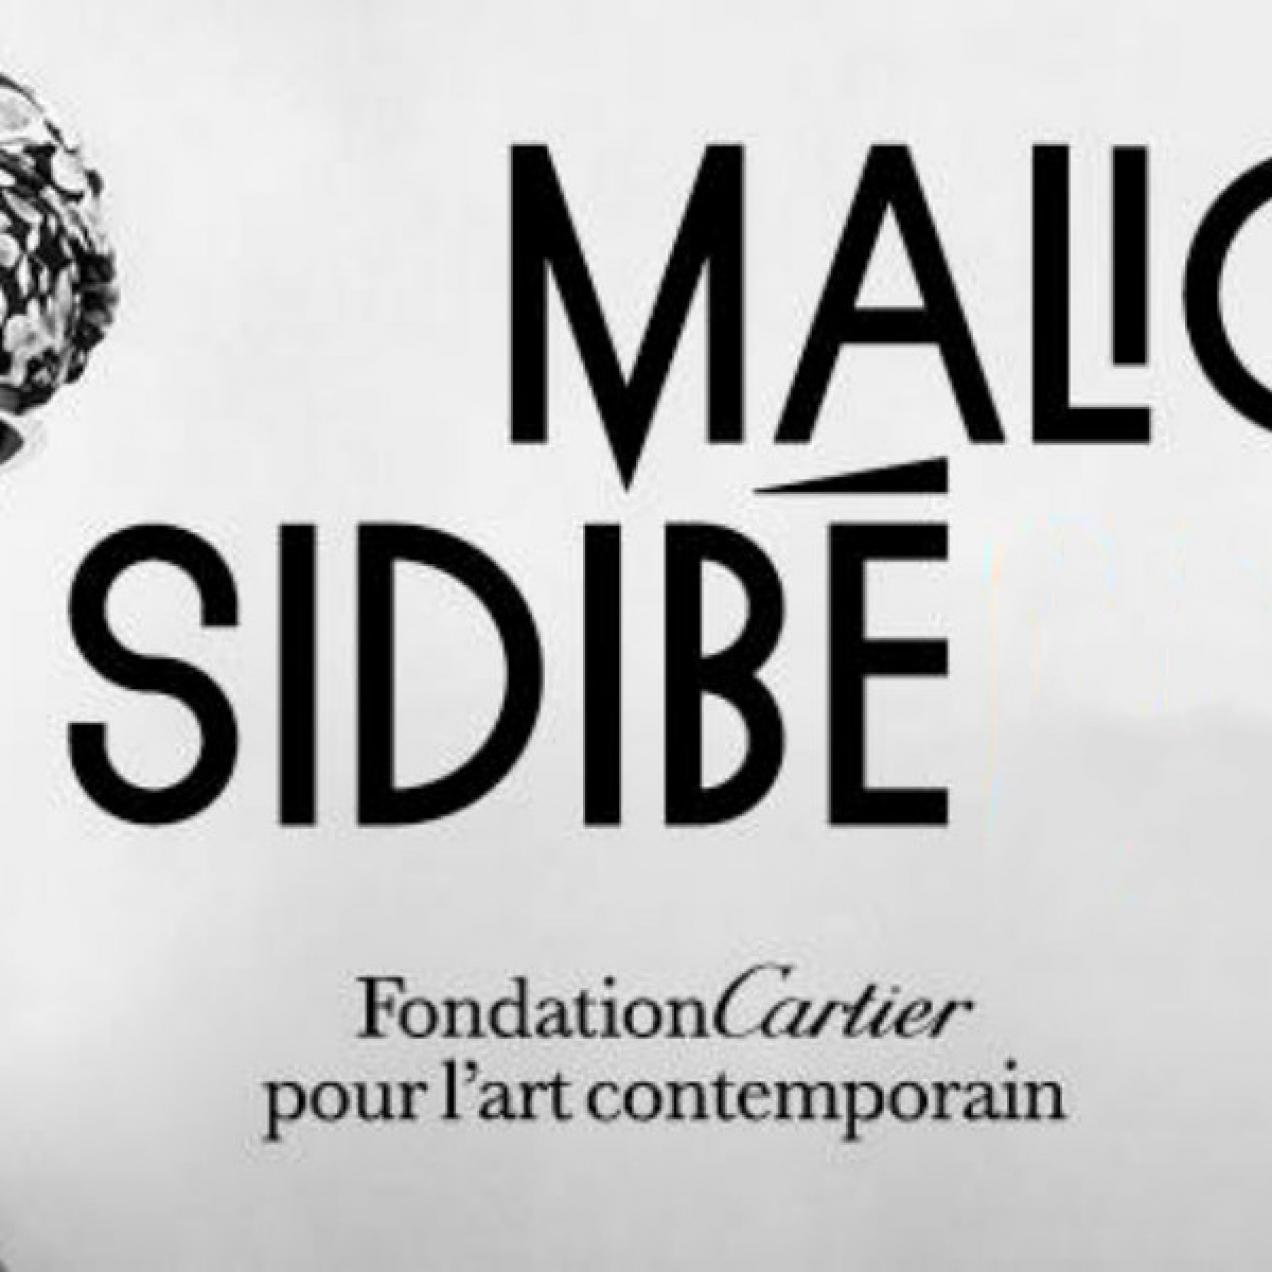 La Fondation Cartier organise un grand bal populaire salsa/rumba/twist